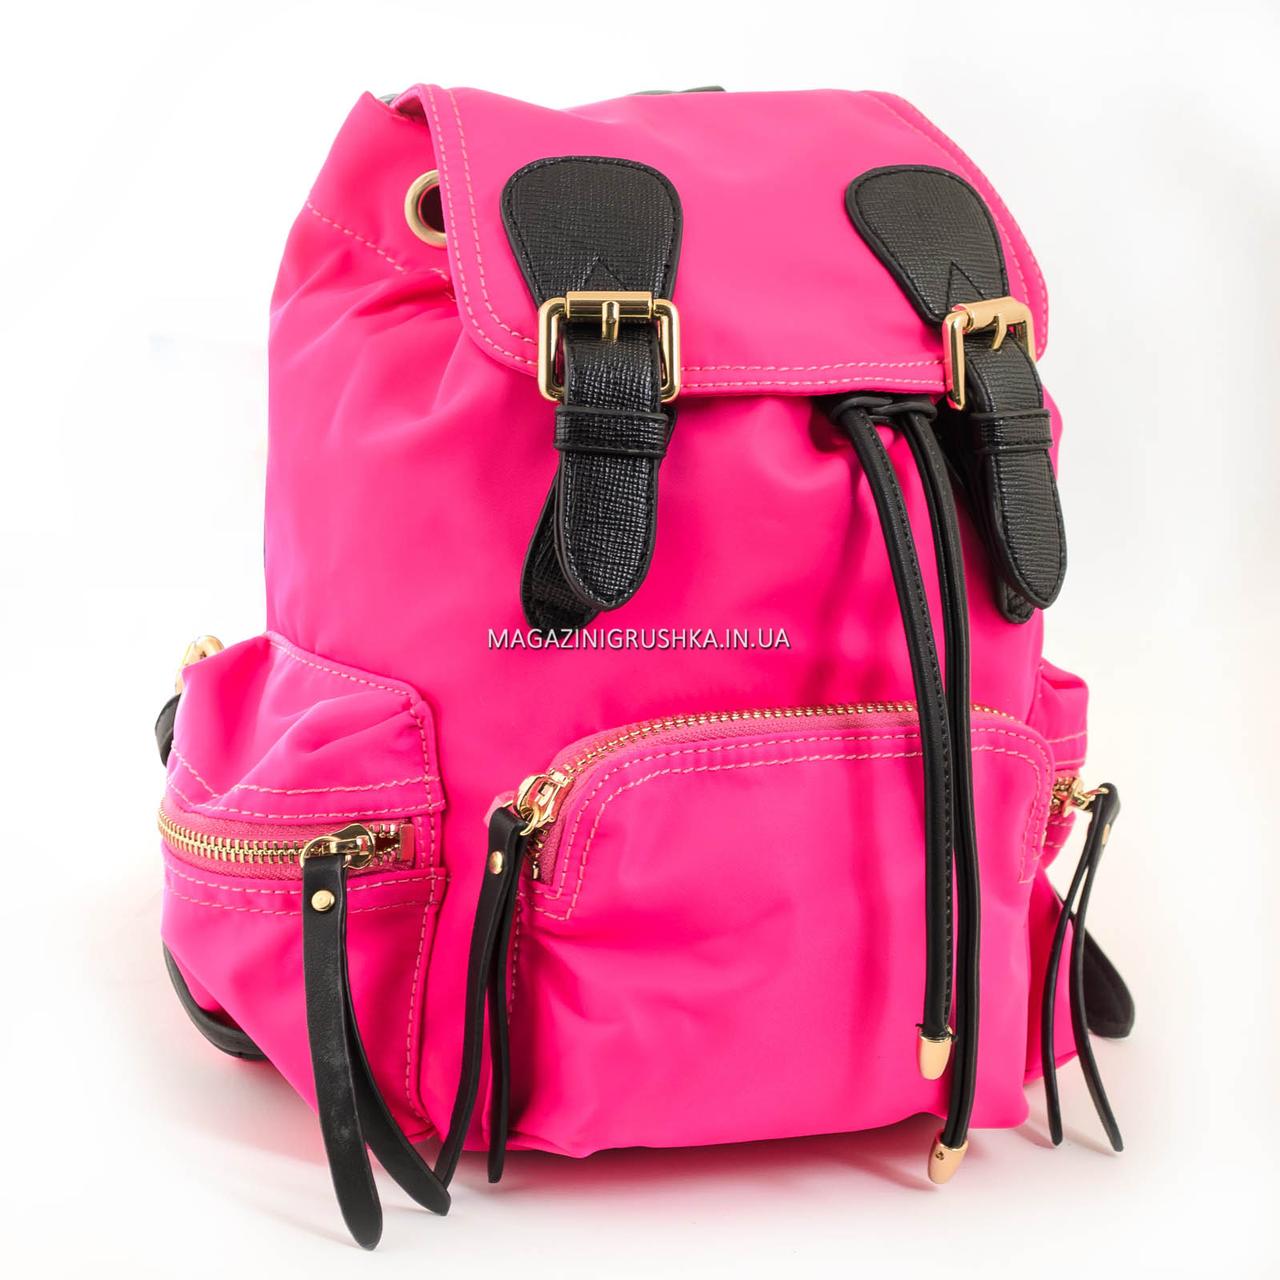 Сумка-рюкзак YES, ярко-розовый (554426)